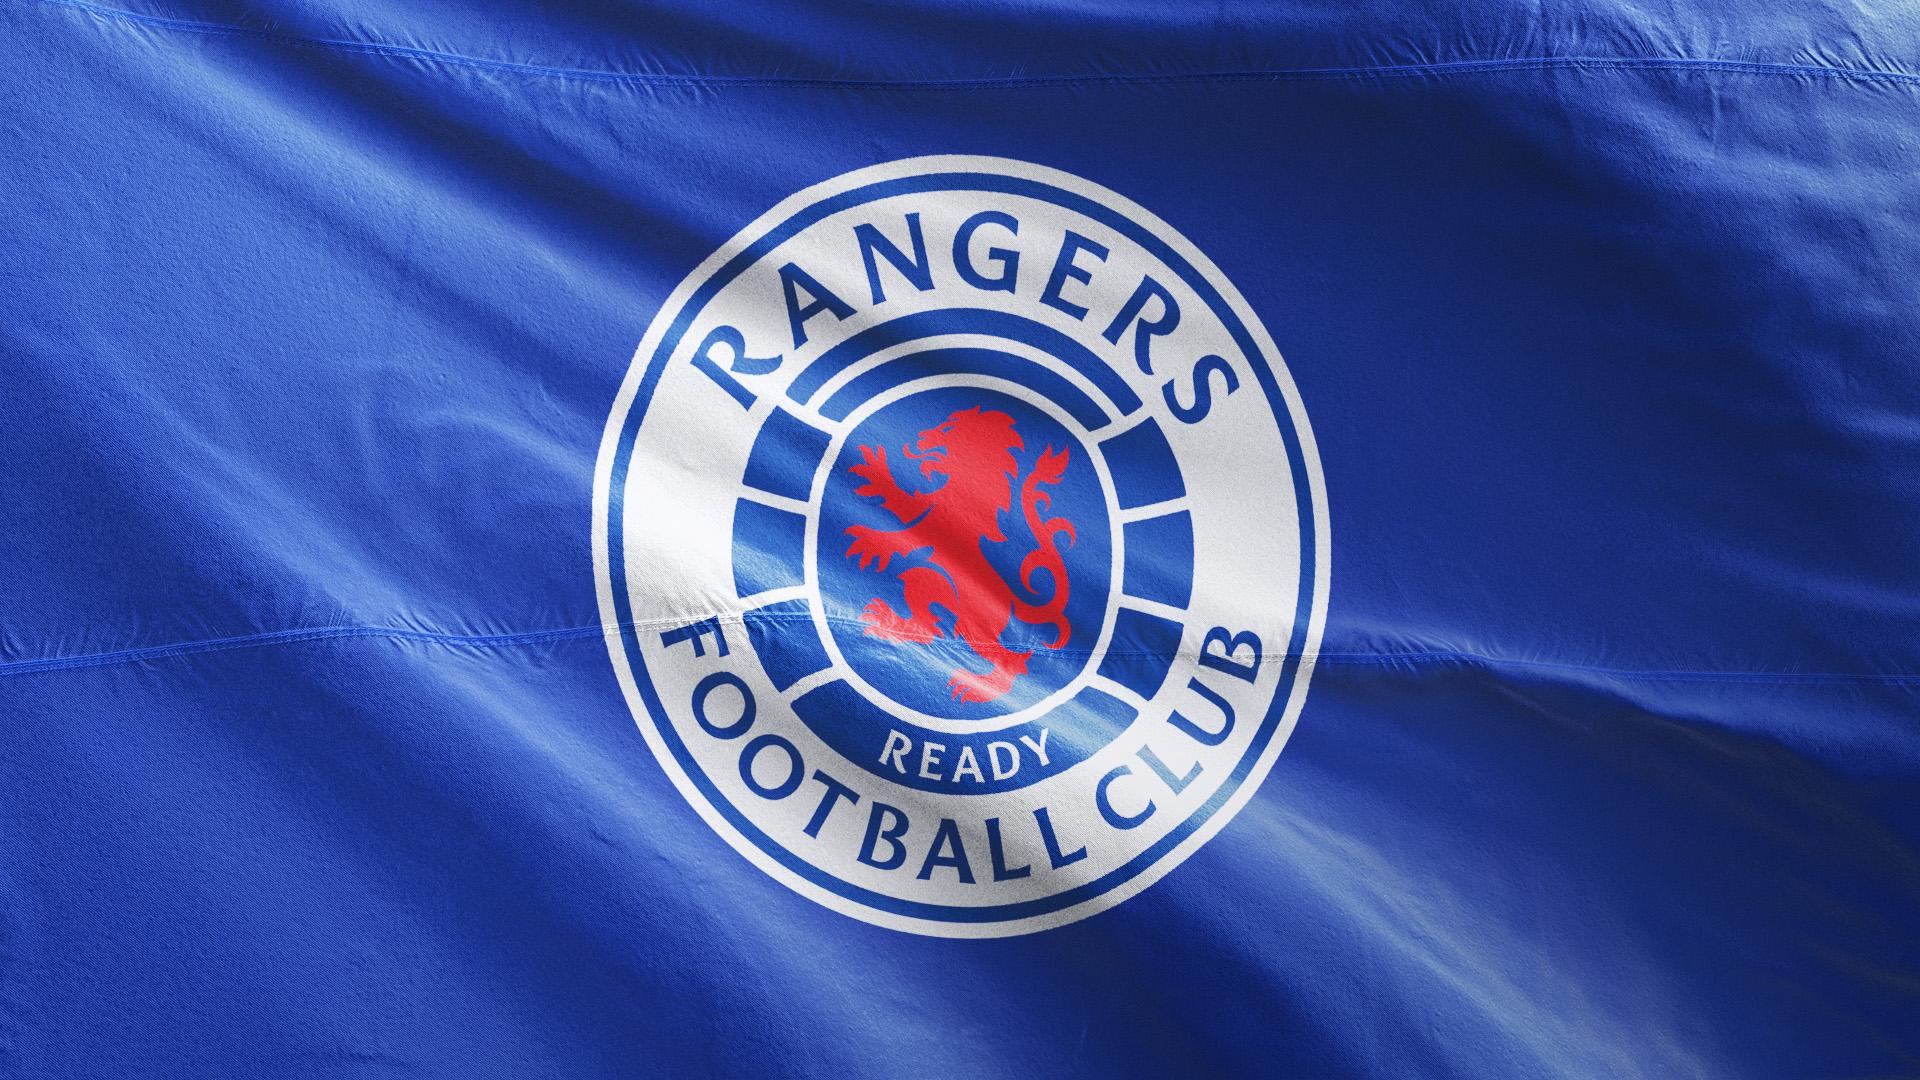 Rangers Football Club Rebrand by See Saw Creative and Craig Black